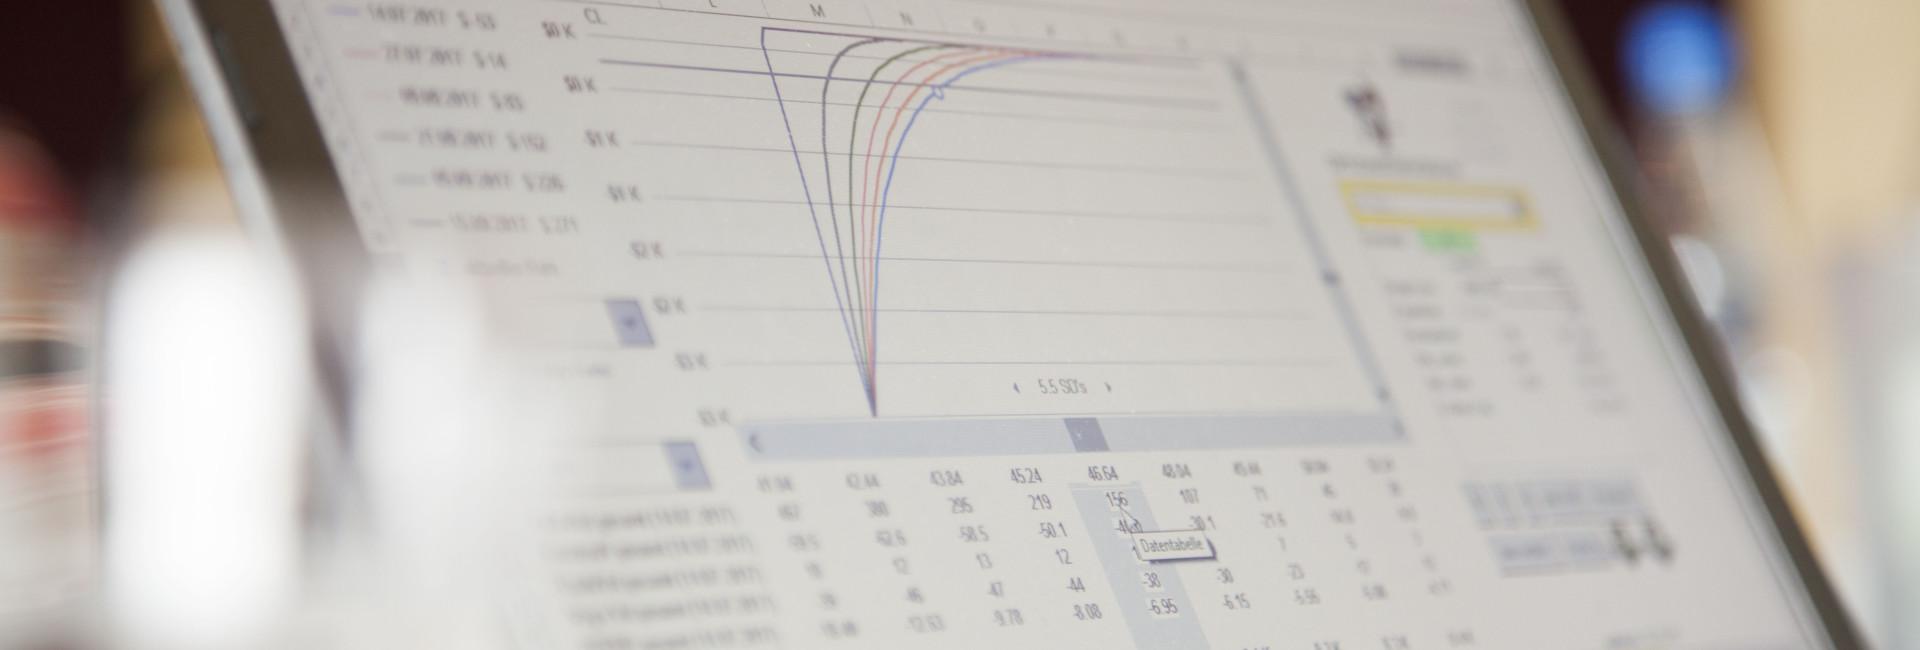 charts_laptop